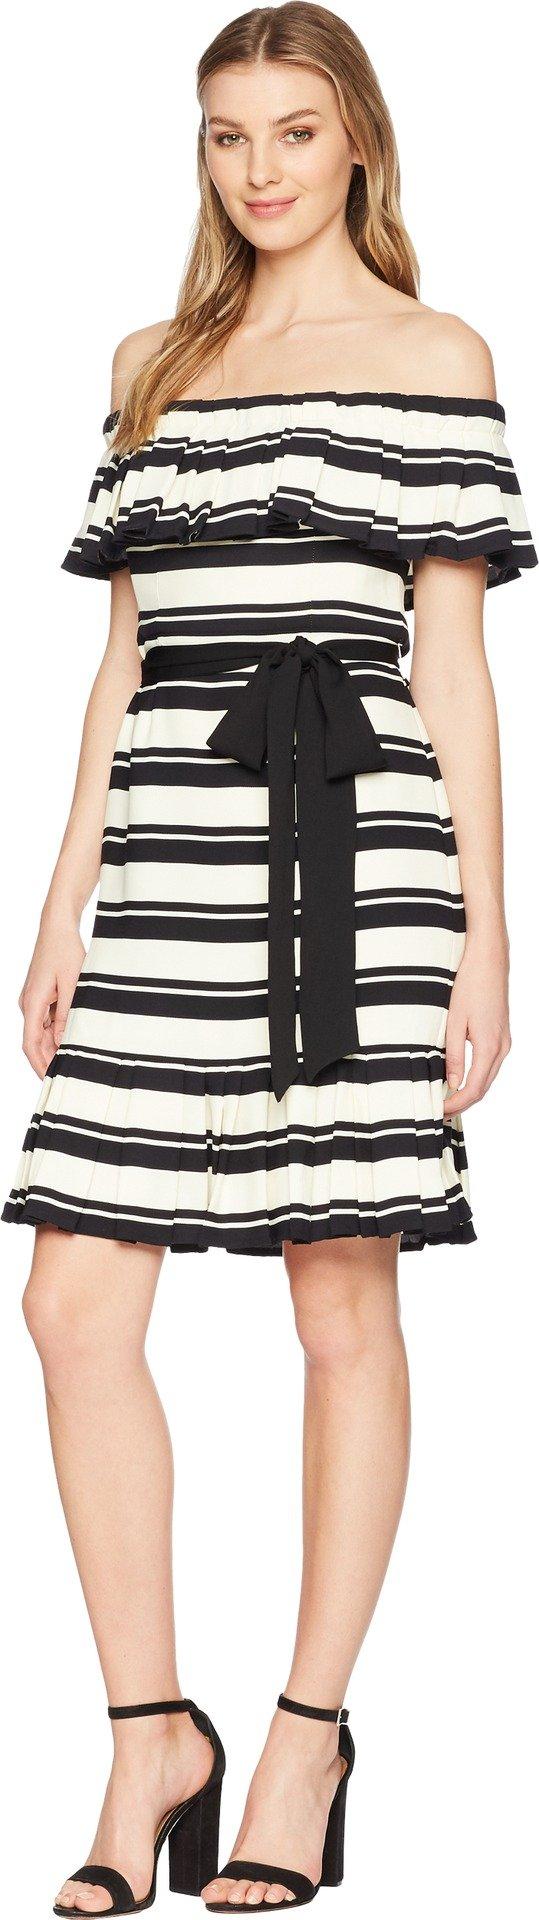 3032da5ca19a Home/Brands/Halston Heritage/Halston Heritage Women's Off Shoulder Flounce  Sleeve Striped Dress, Black/Cream Nouveau, 8. ; 